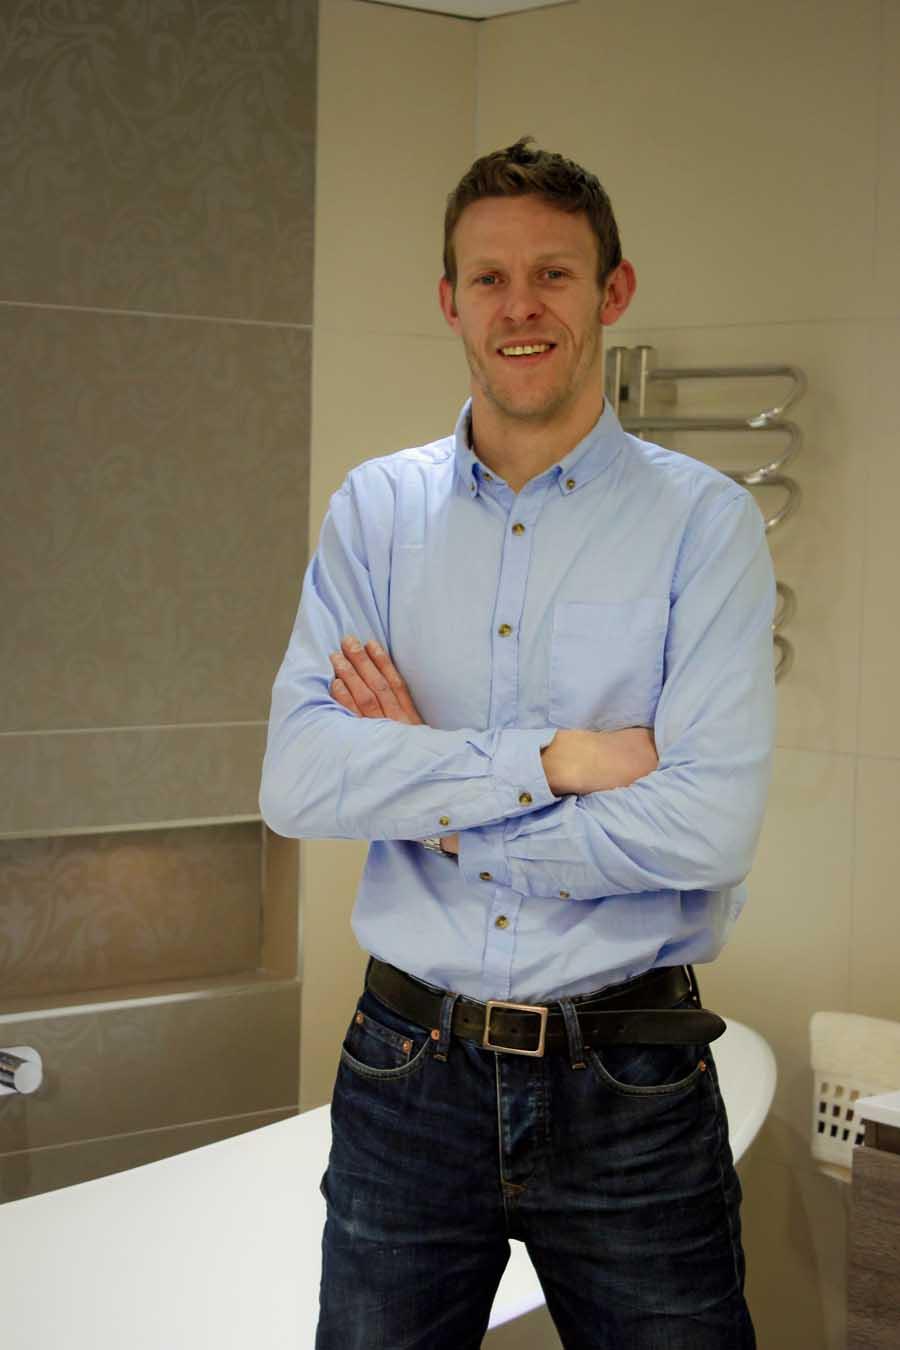 David Burgess managing director of UK Tiles Direct and Room H2o Bathrooms in Dorset